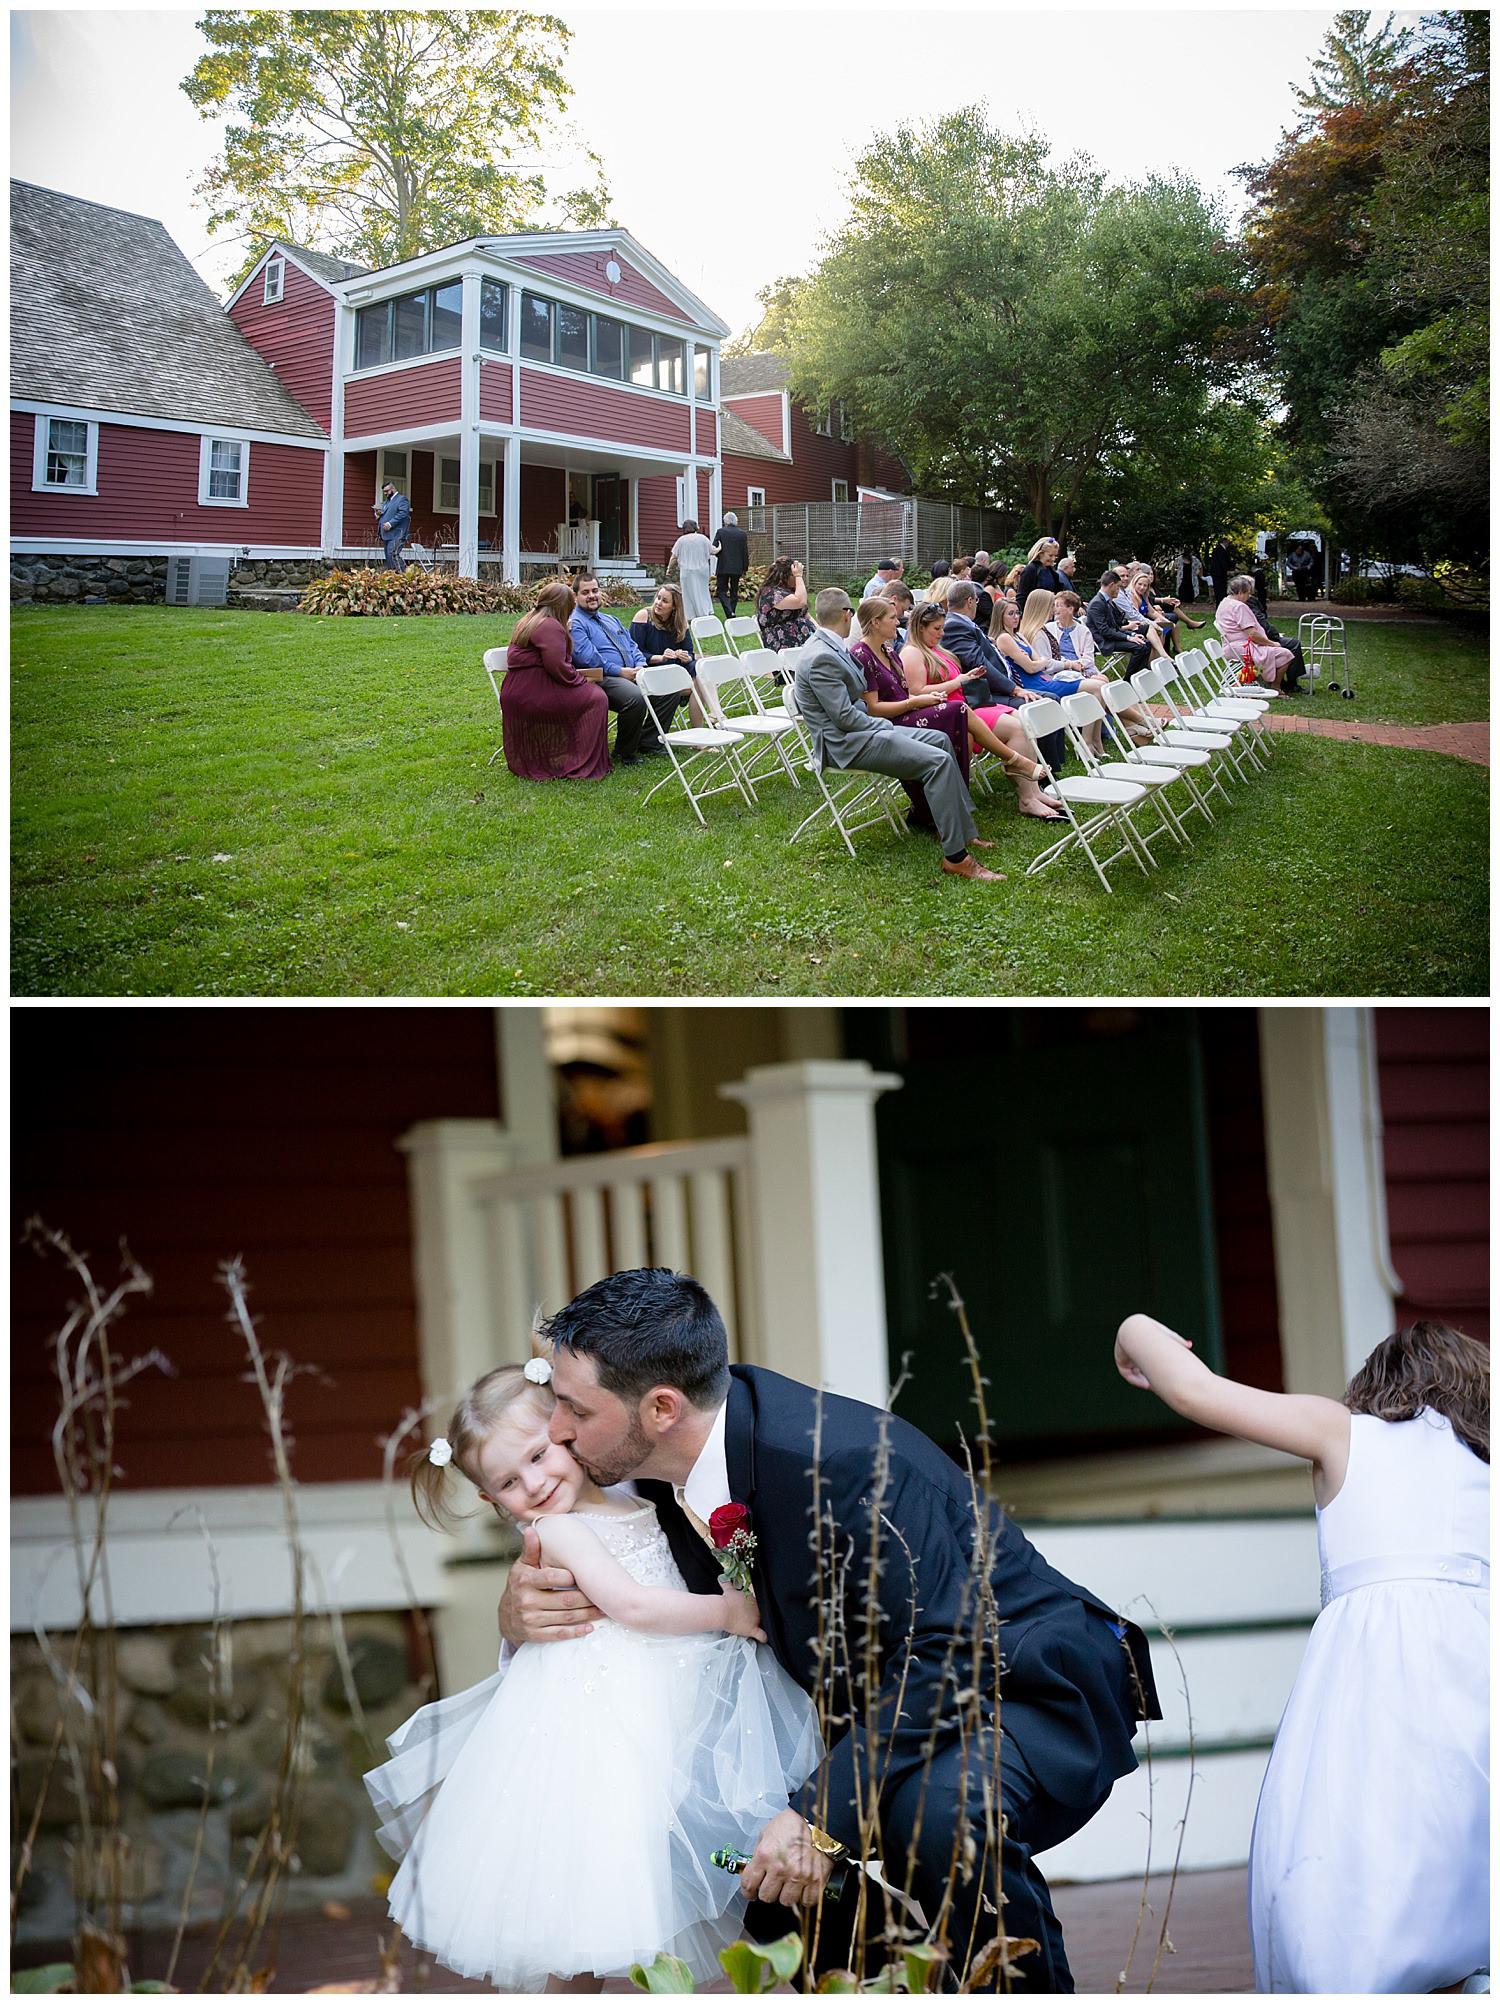 smith-barn-brooksby-farm-wedding-26-north-studios-boston-wedding-photographer-016.jpg